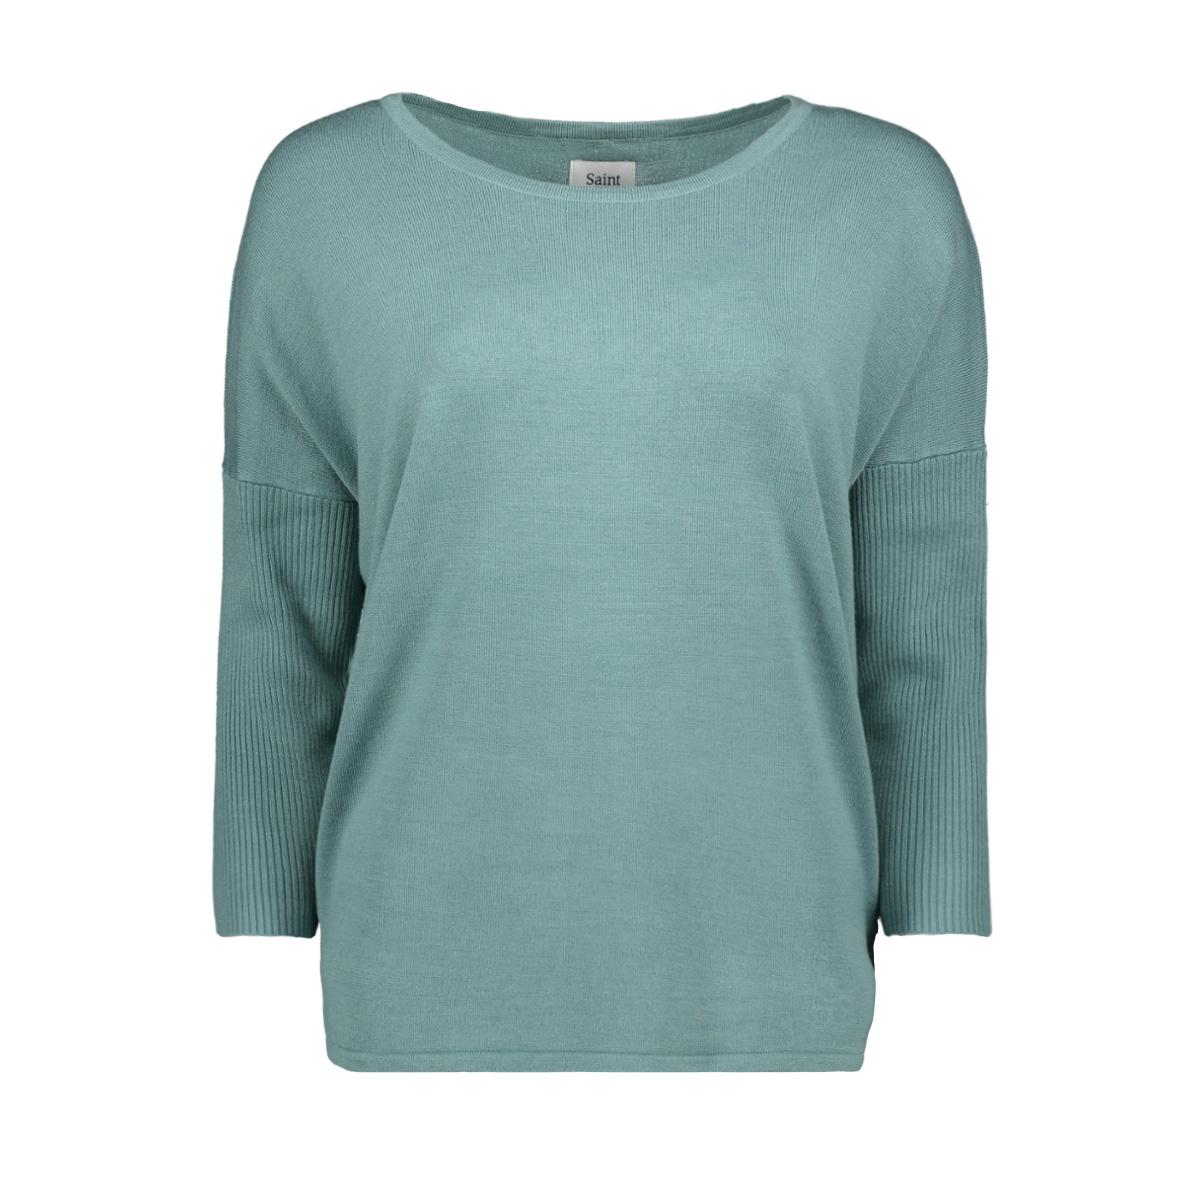 knit blouse a2561 saint tropez trui 9392